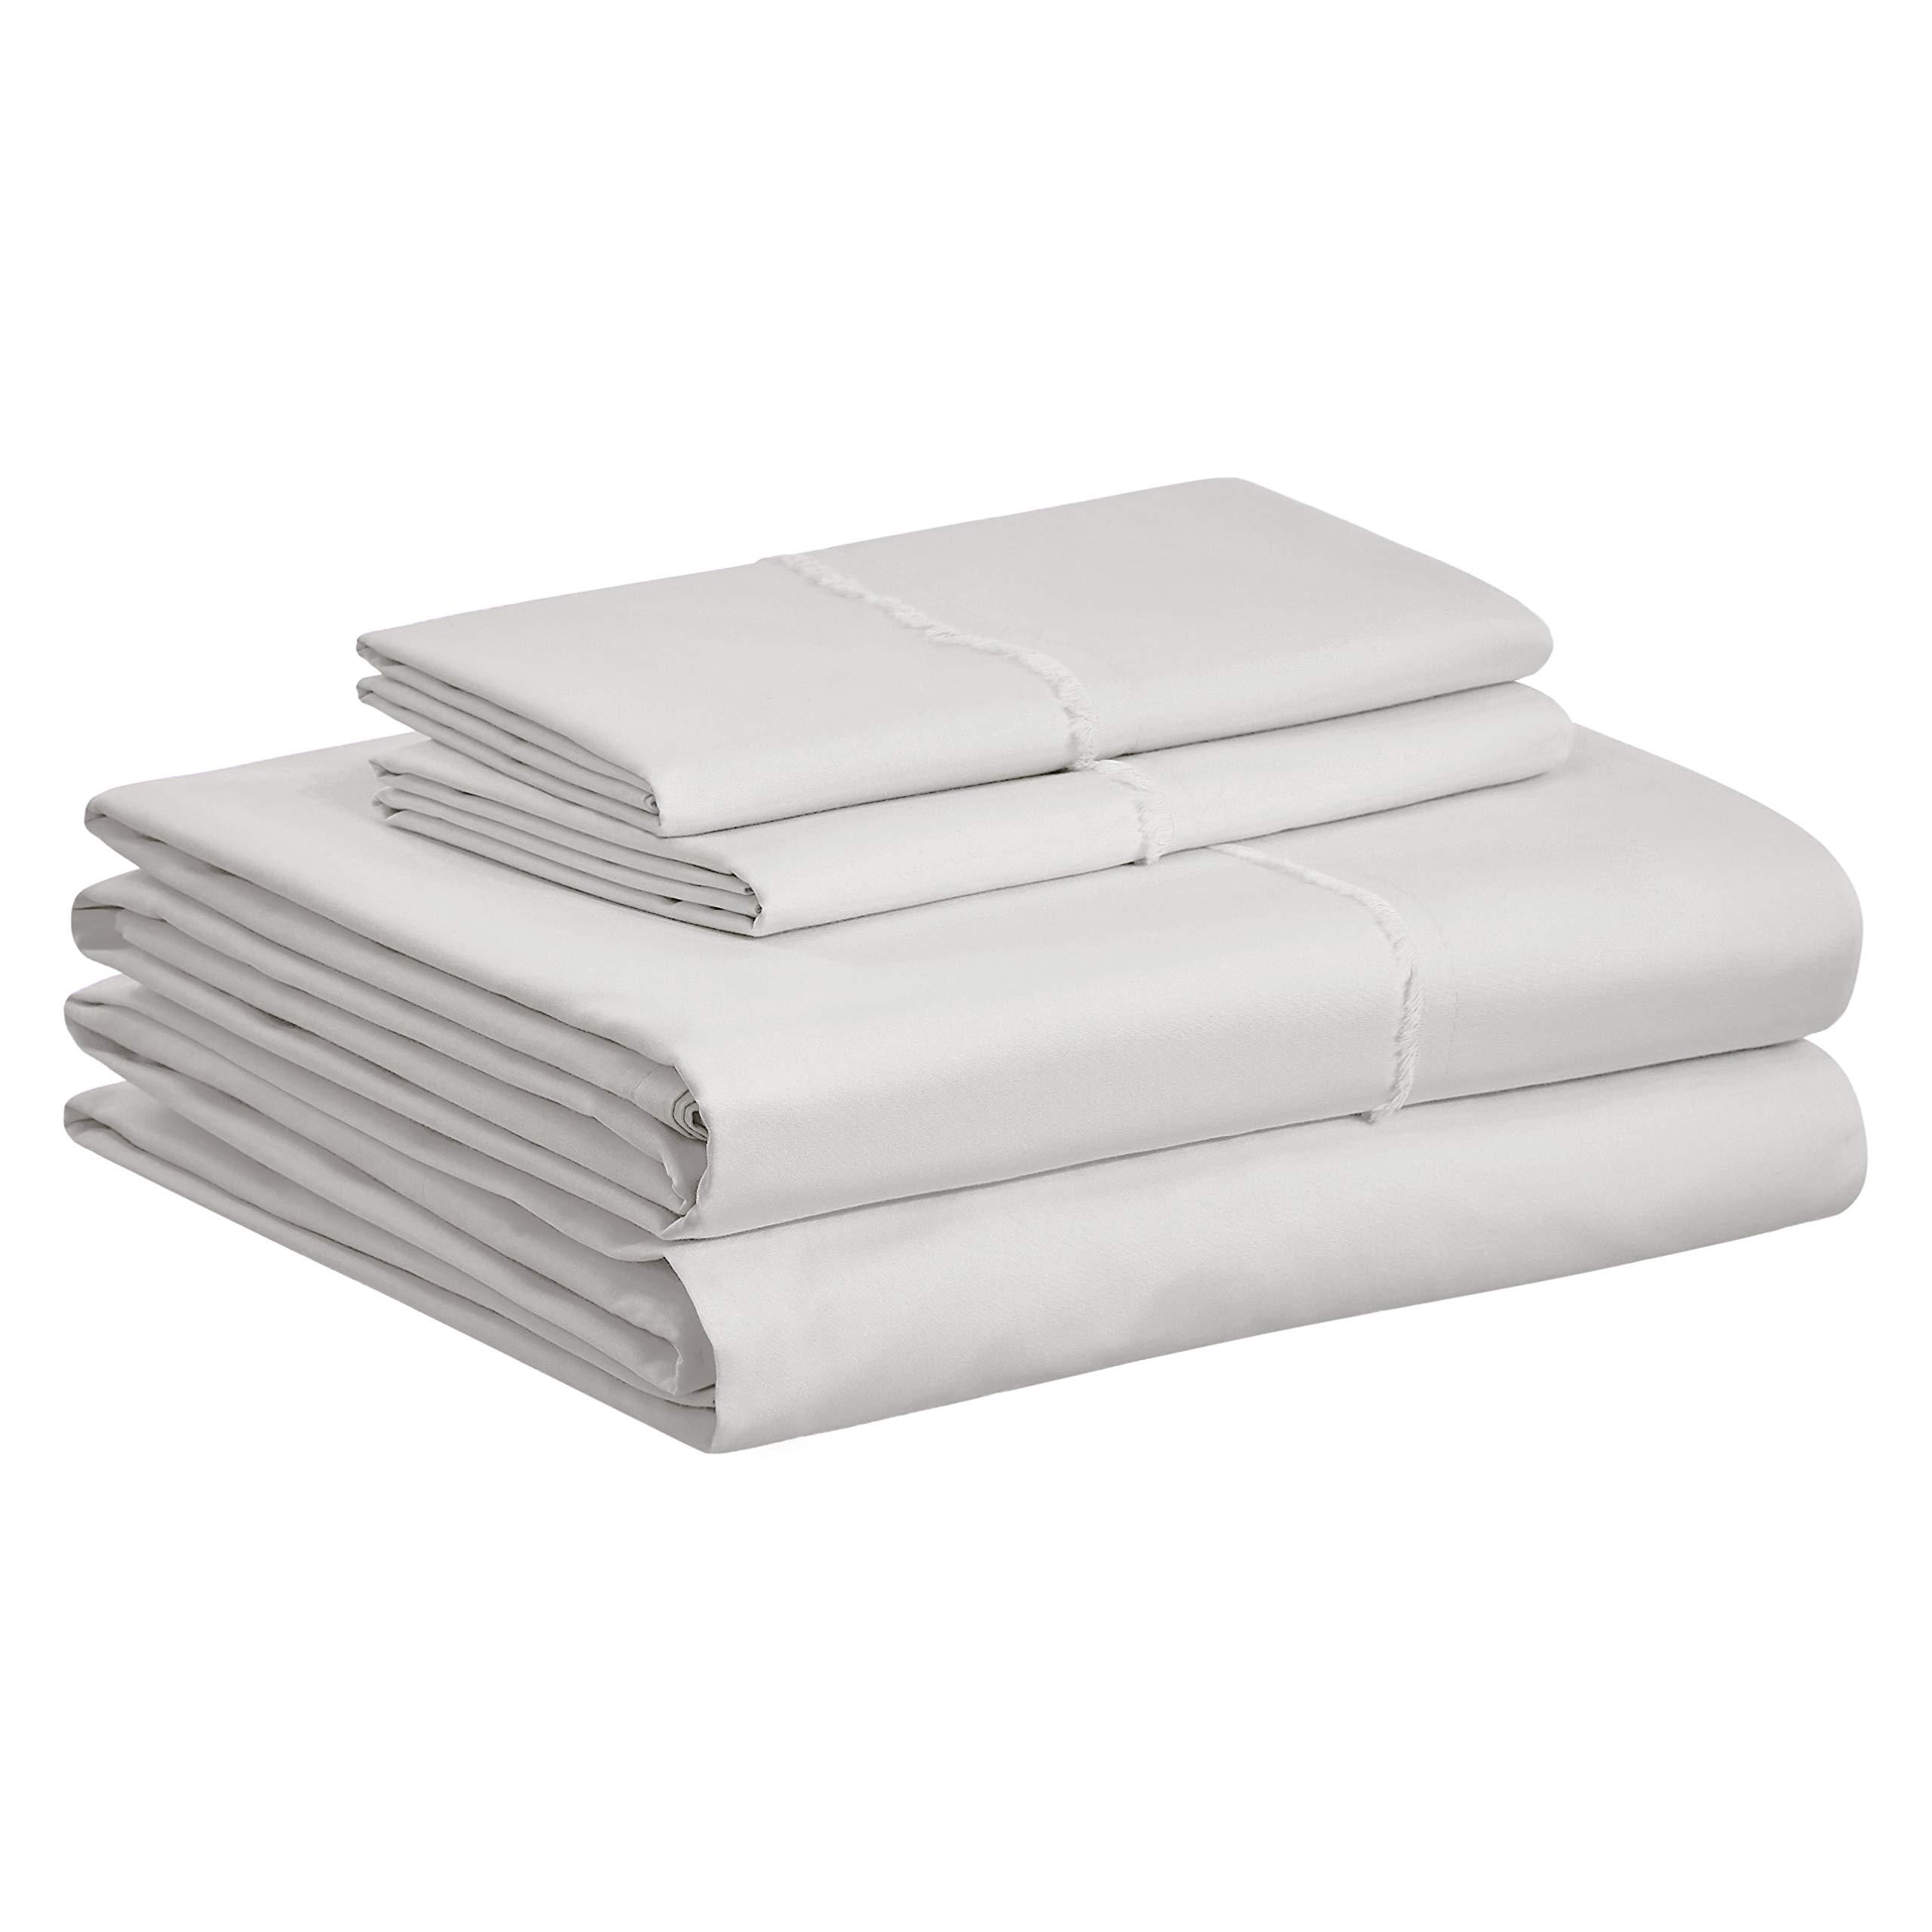 AmazonBasics Organic Percale Cotton Sheet Set with Frayed Hem - Queen, Soft Grey